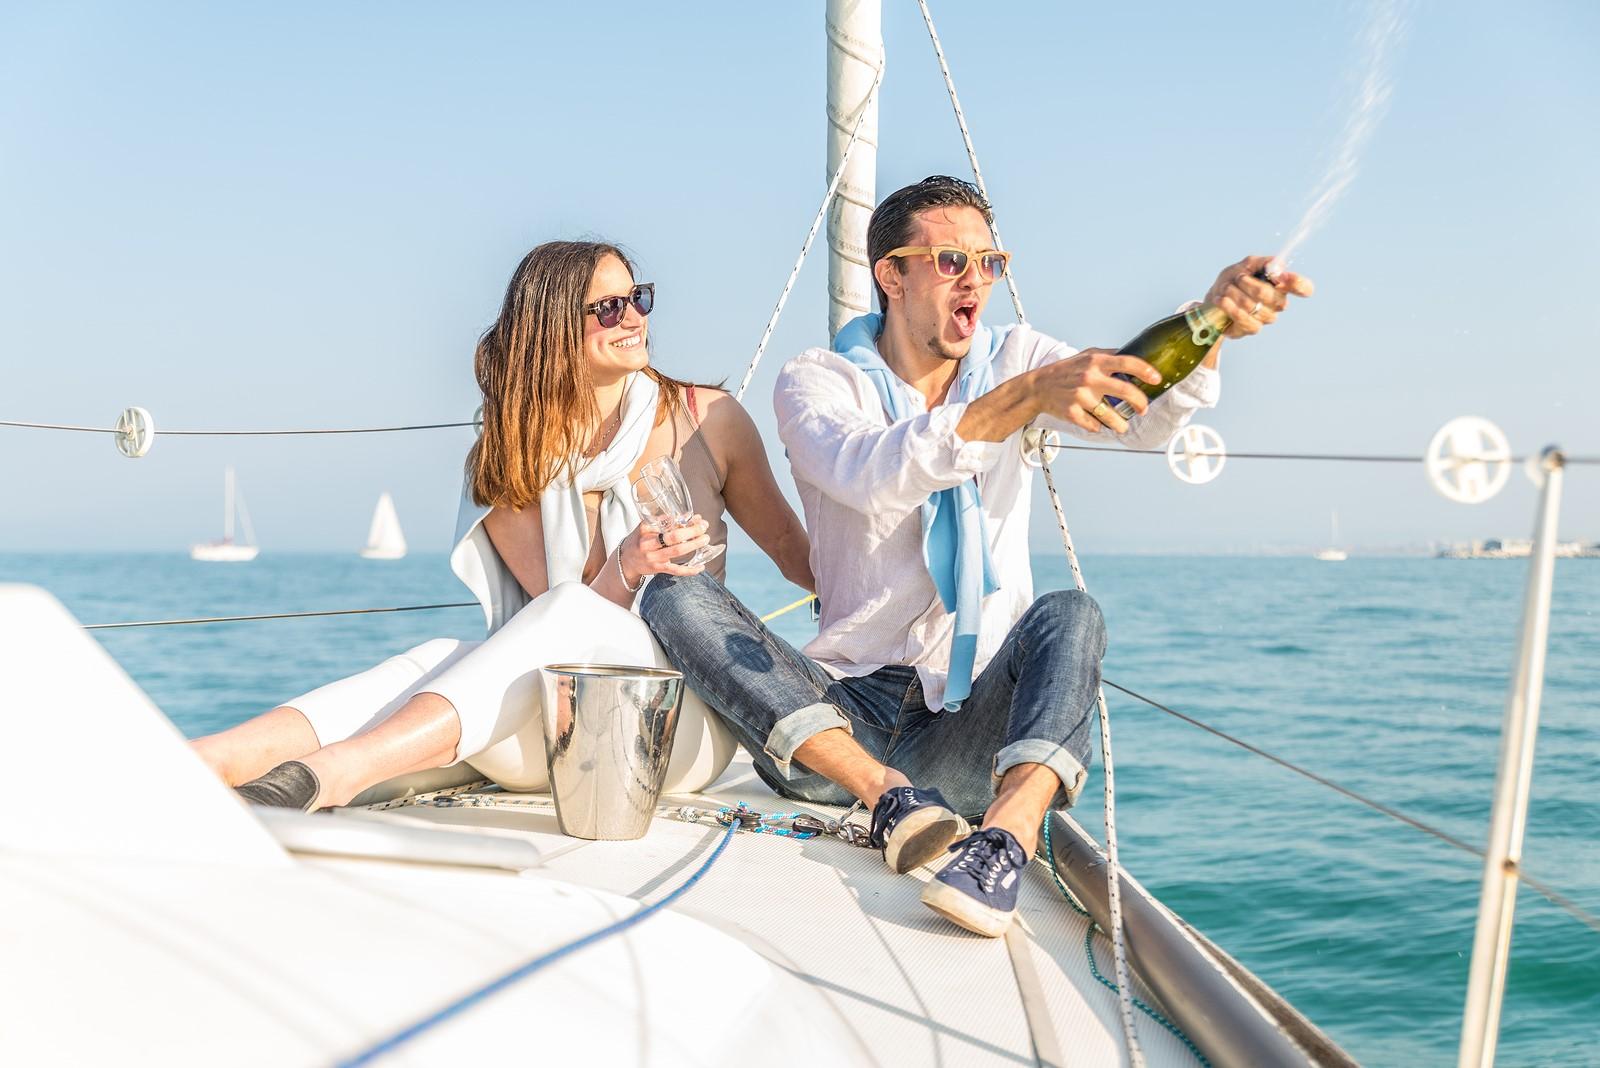 bigstock-Couple-Celebrating-On-The-Boat-87866582